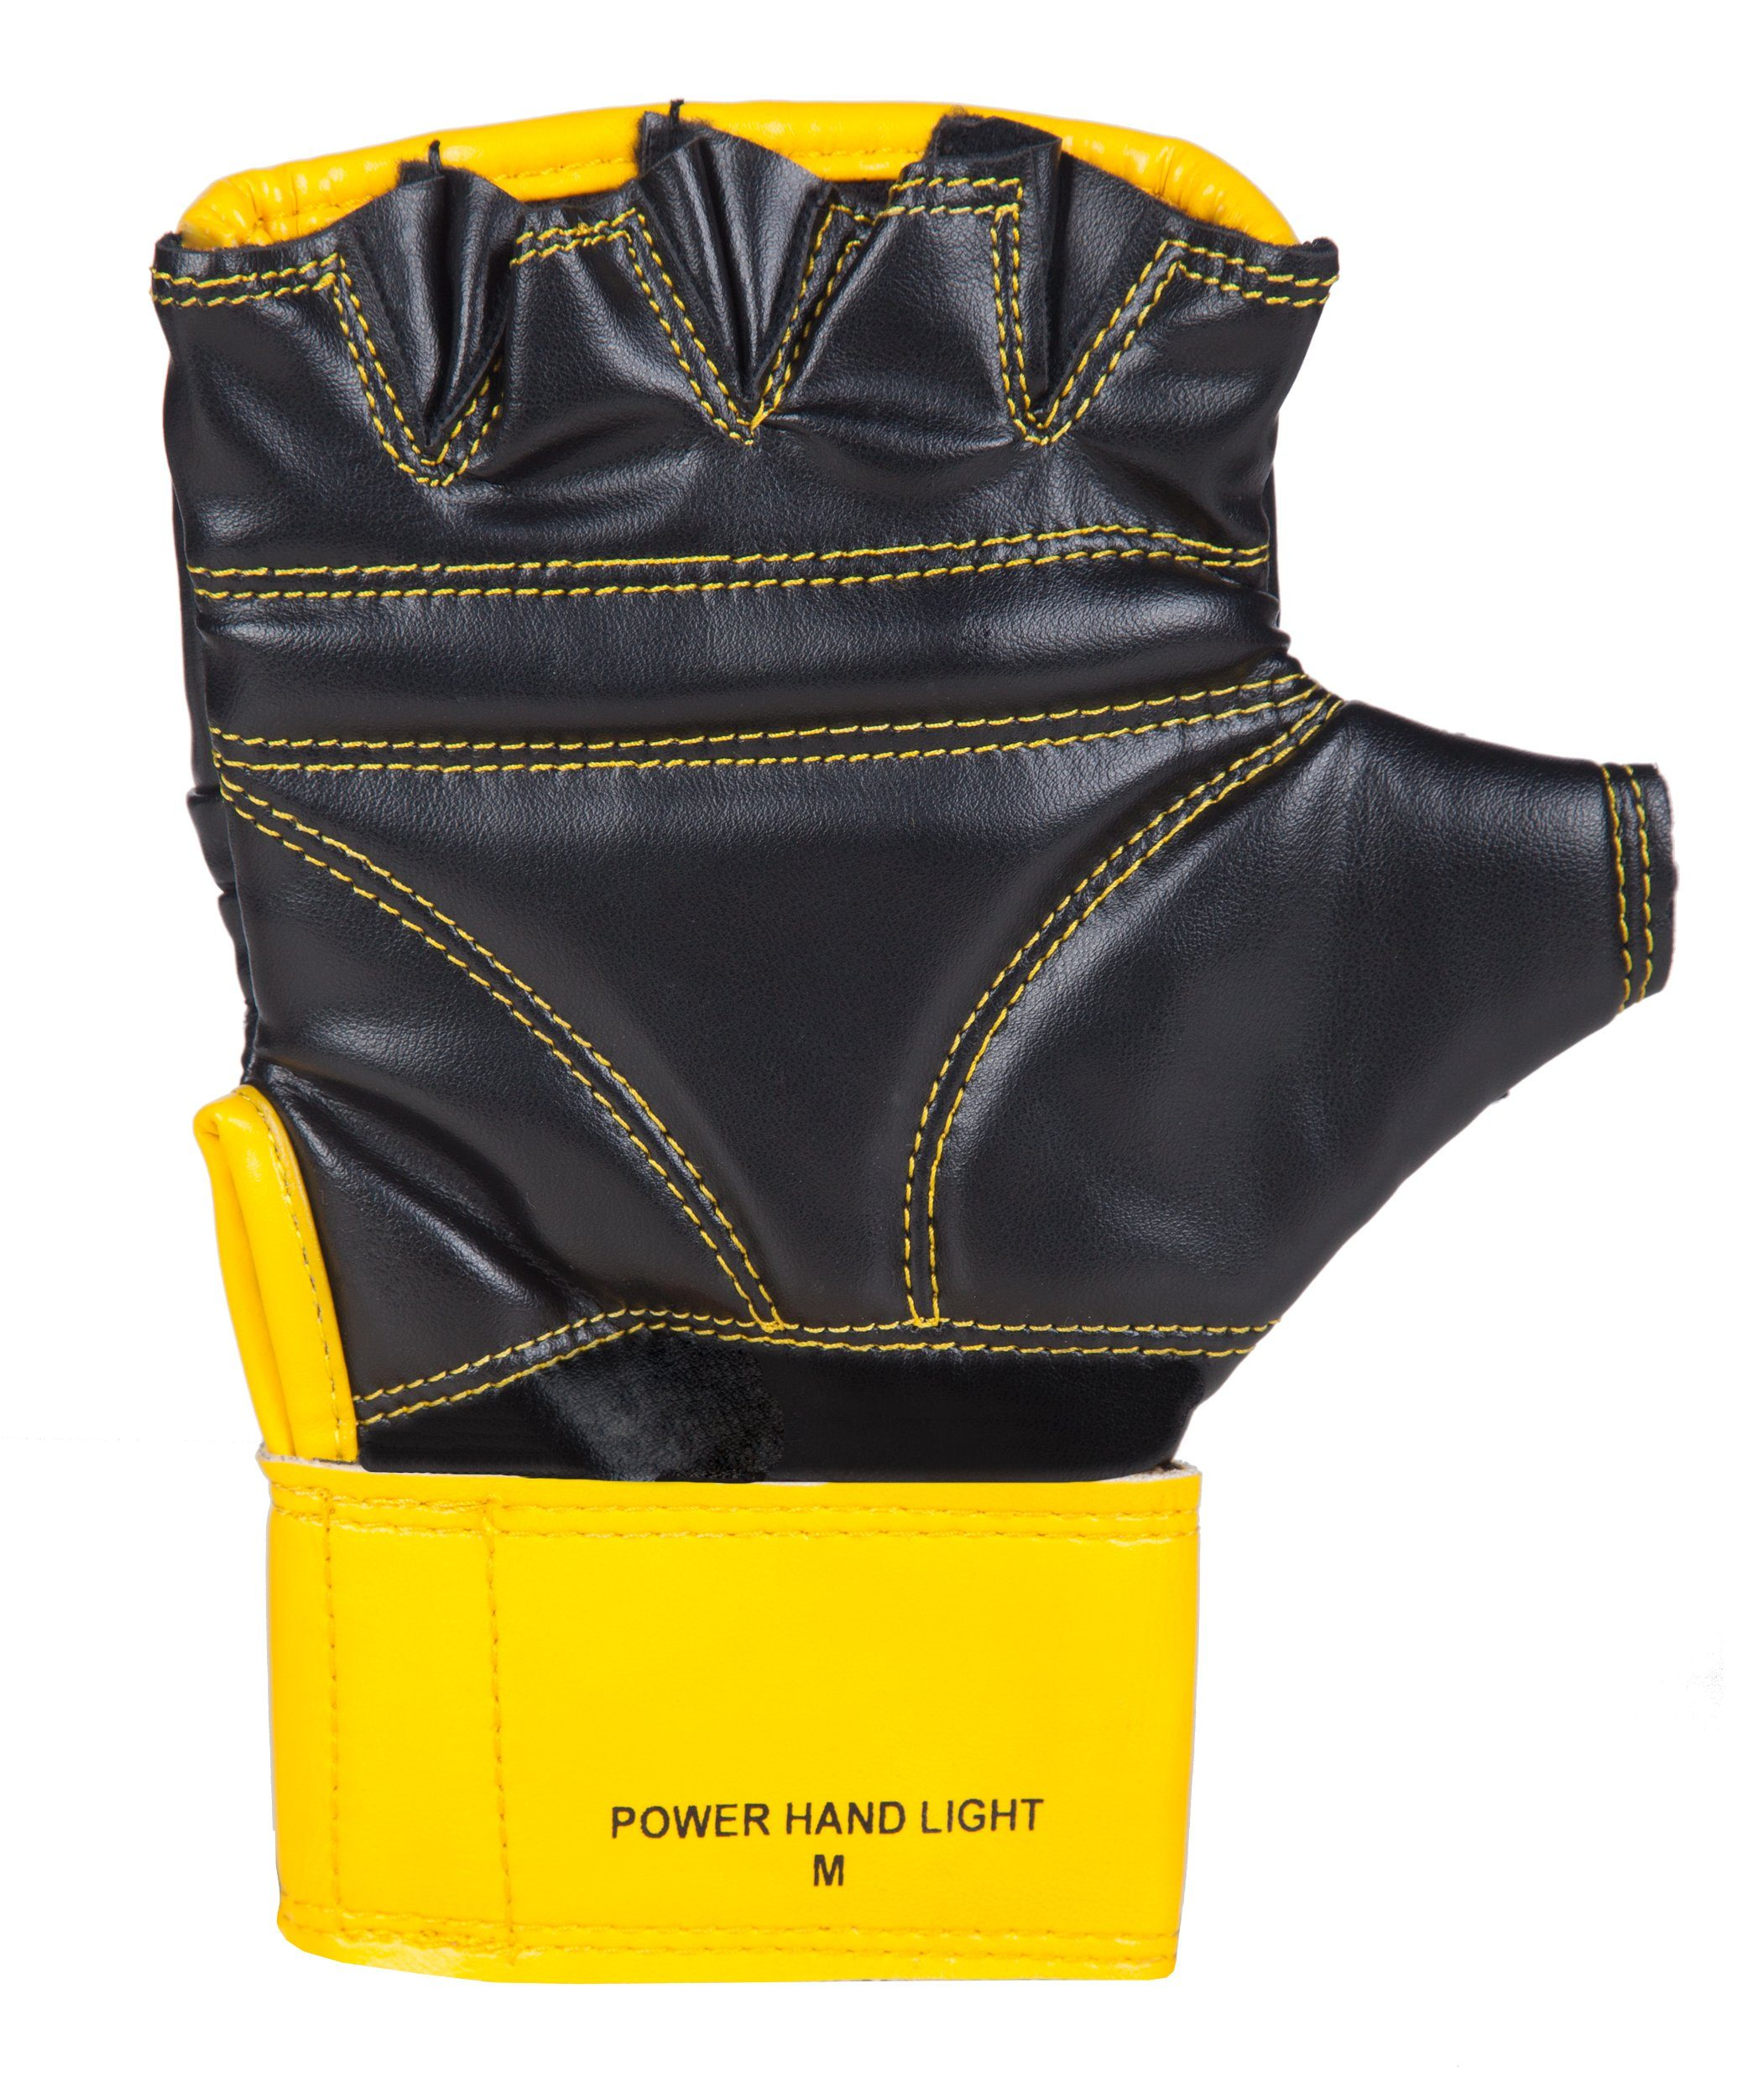 Benlee Rocky Marciano Handschuhe in sportlichem Design POWER HAND LIGHT | Accessoires > Handschuhe | Benlee Rocky Marciano